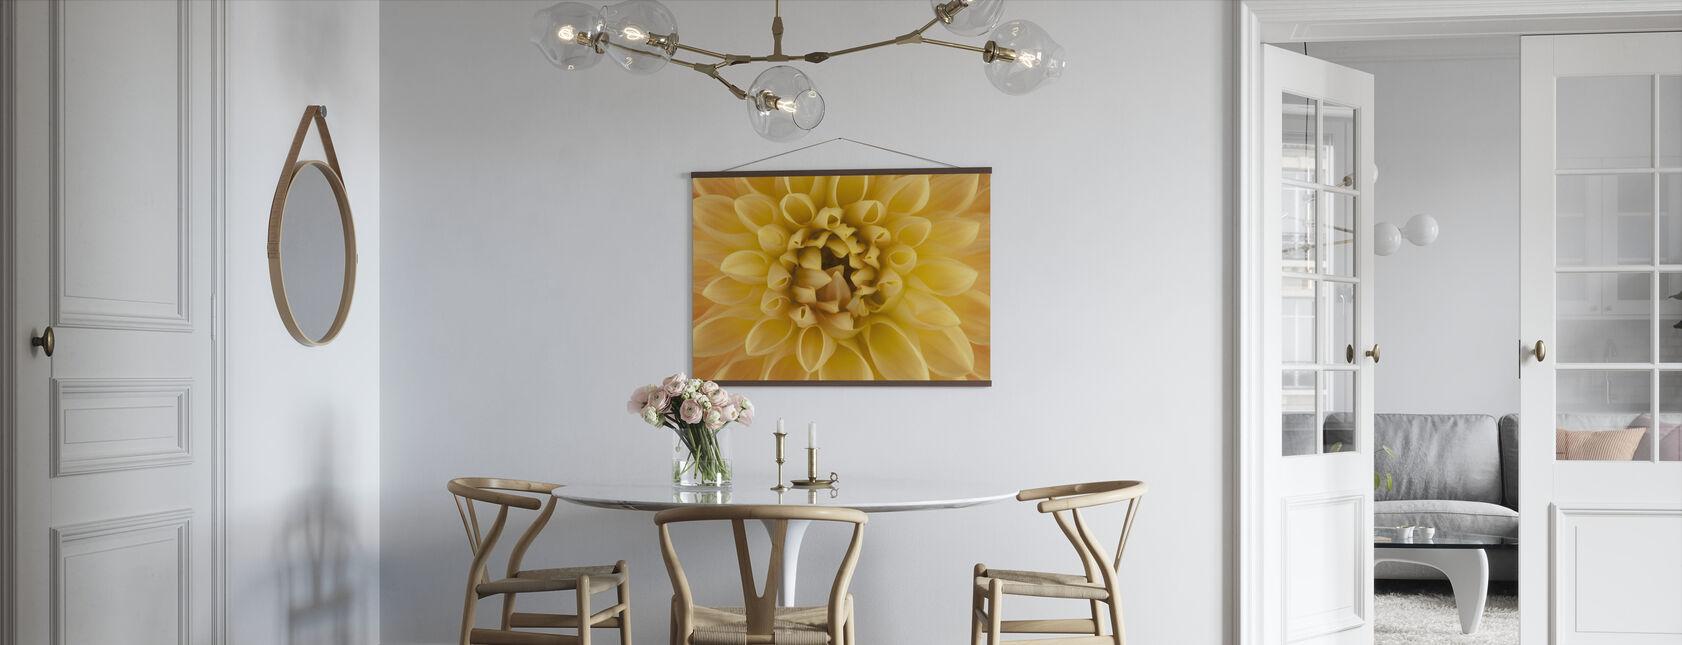 Amber Dahlia - Poster - Kitchen